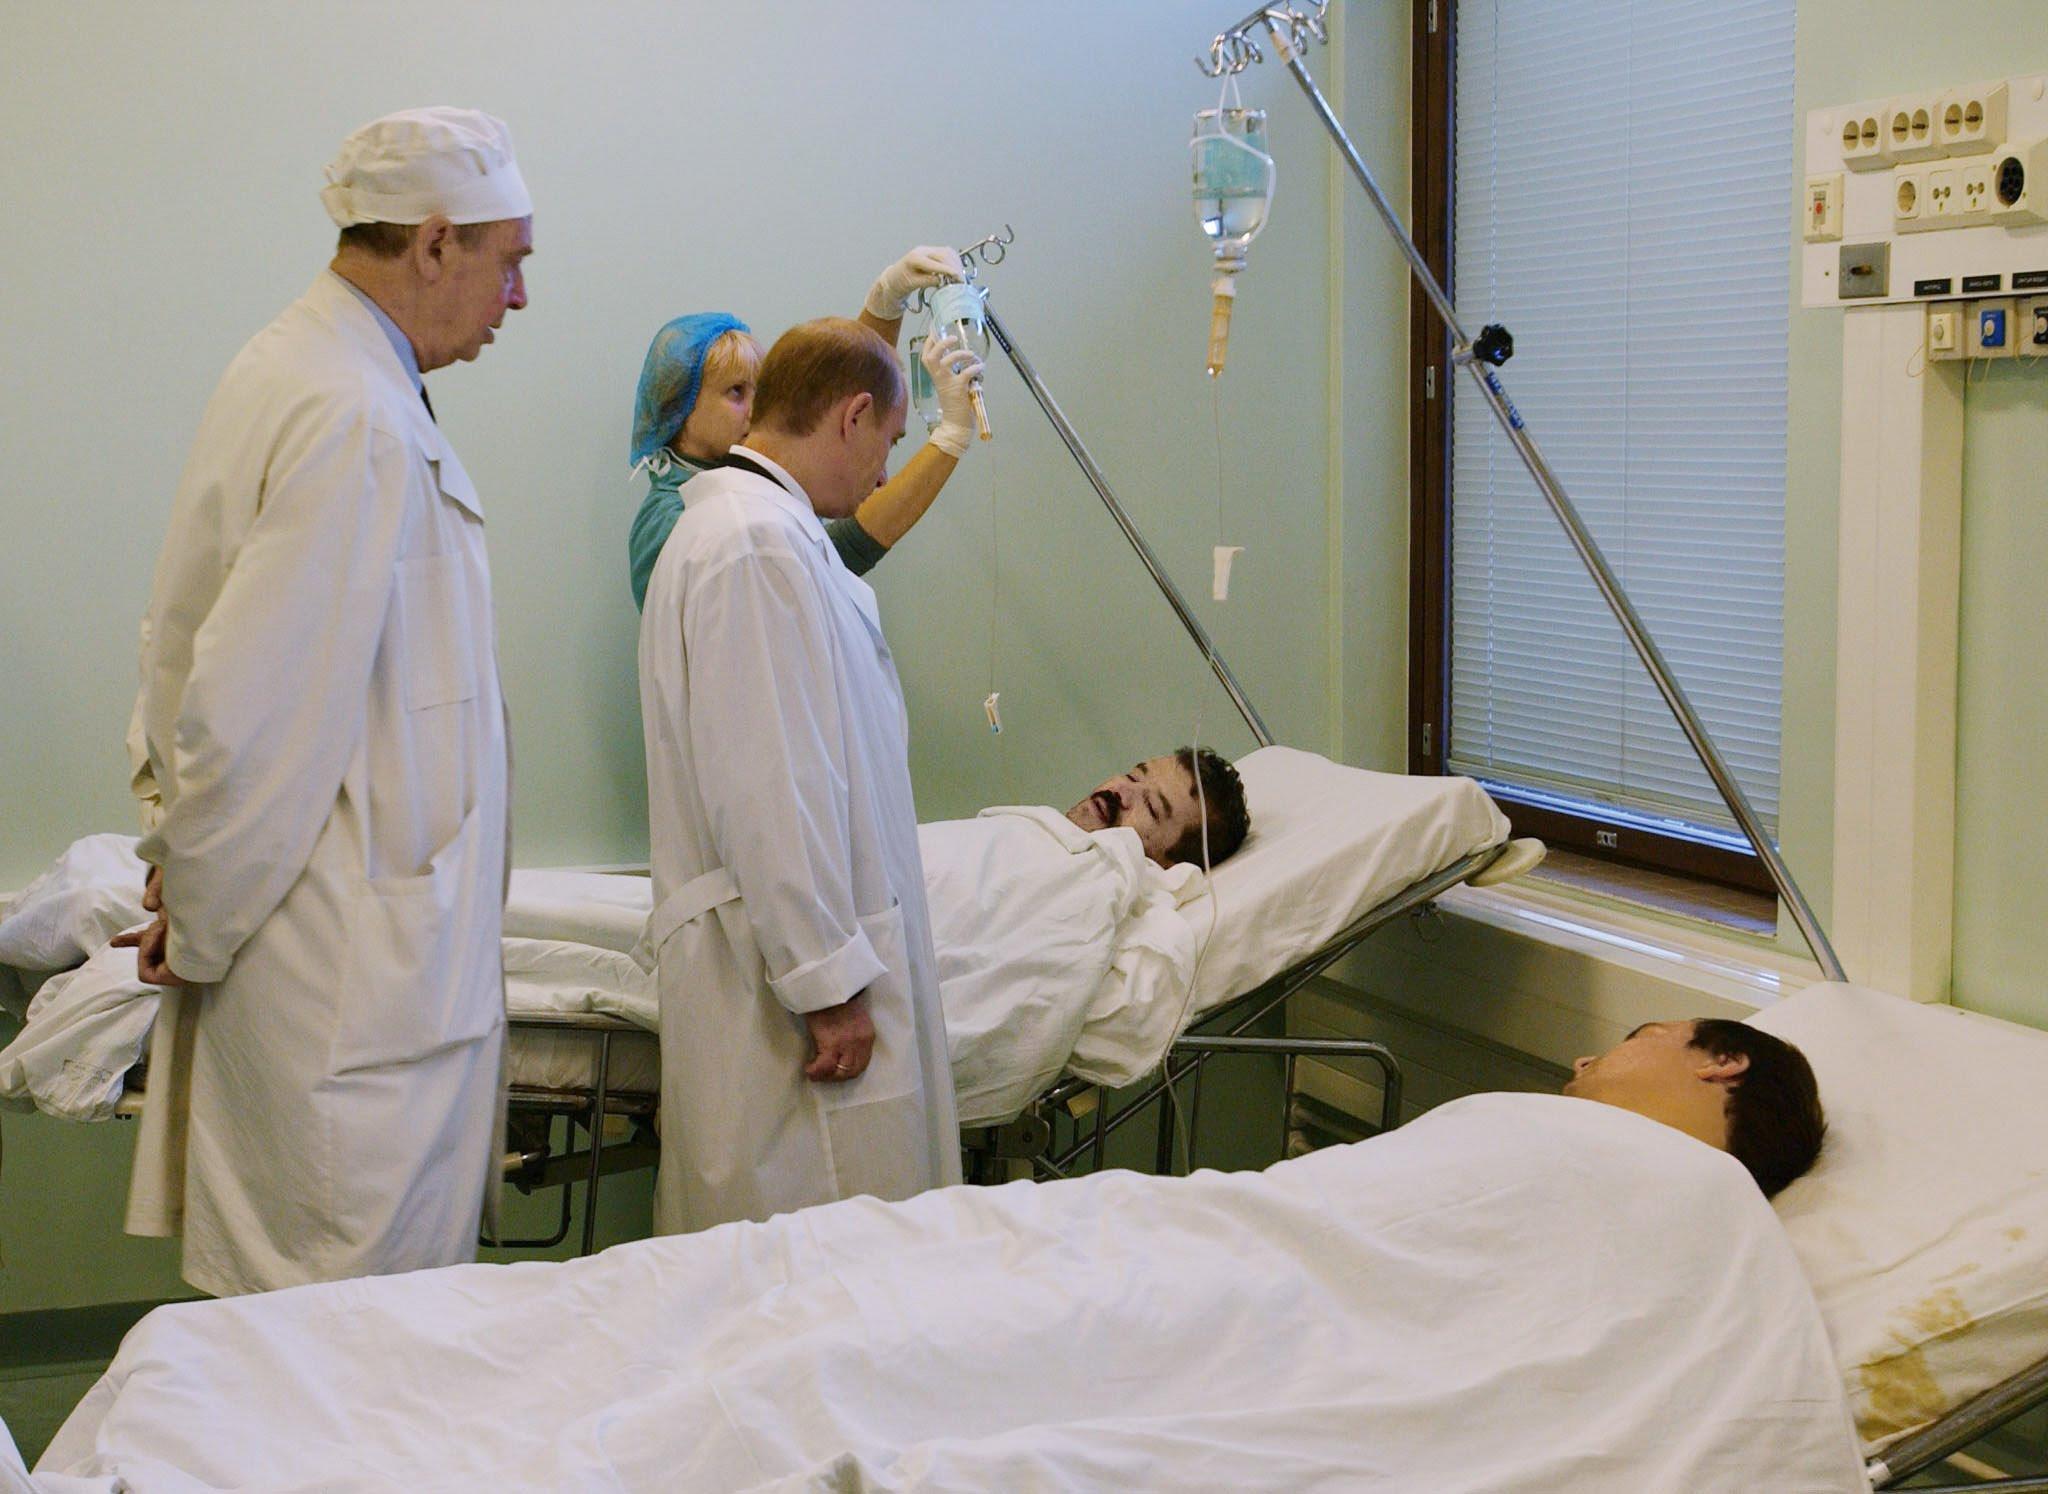 File:Vladimir Putin with victims of Nord-Ost terrorism.jpg